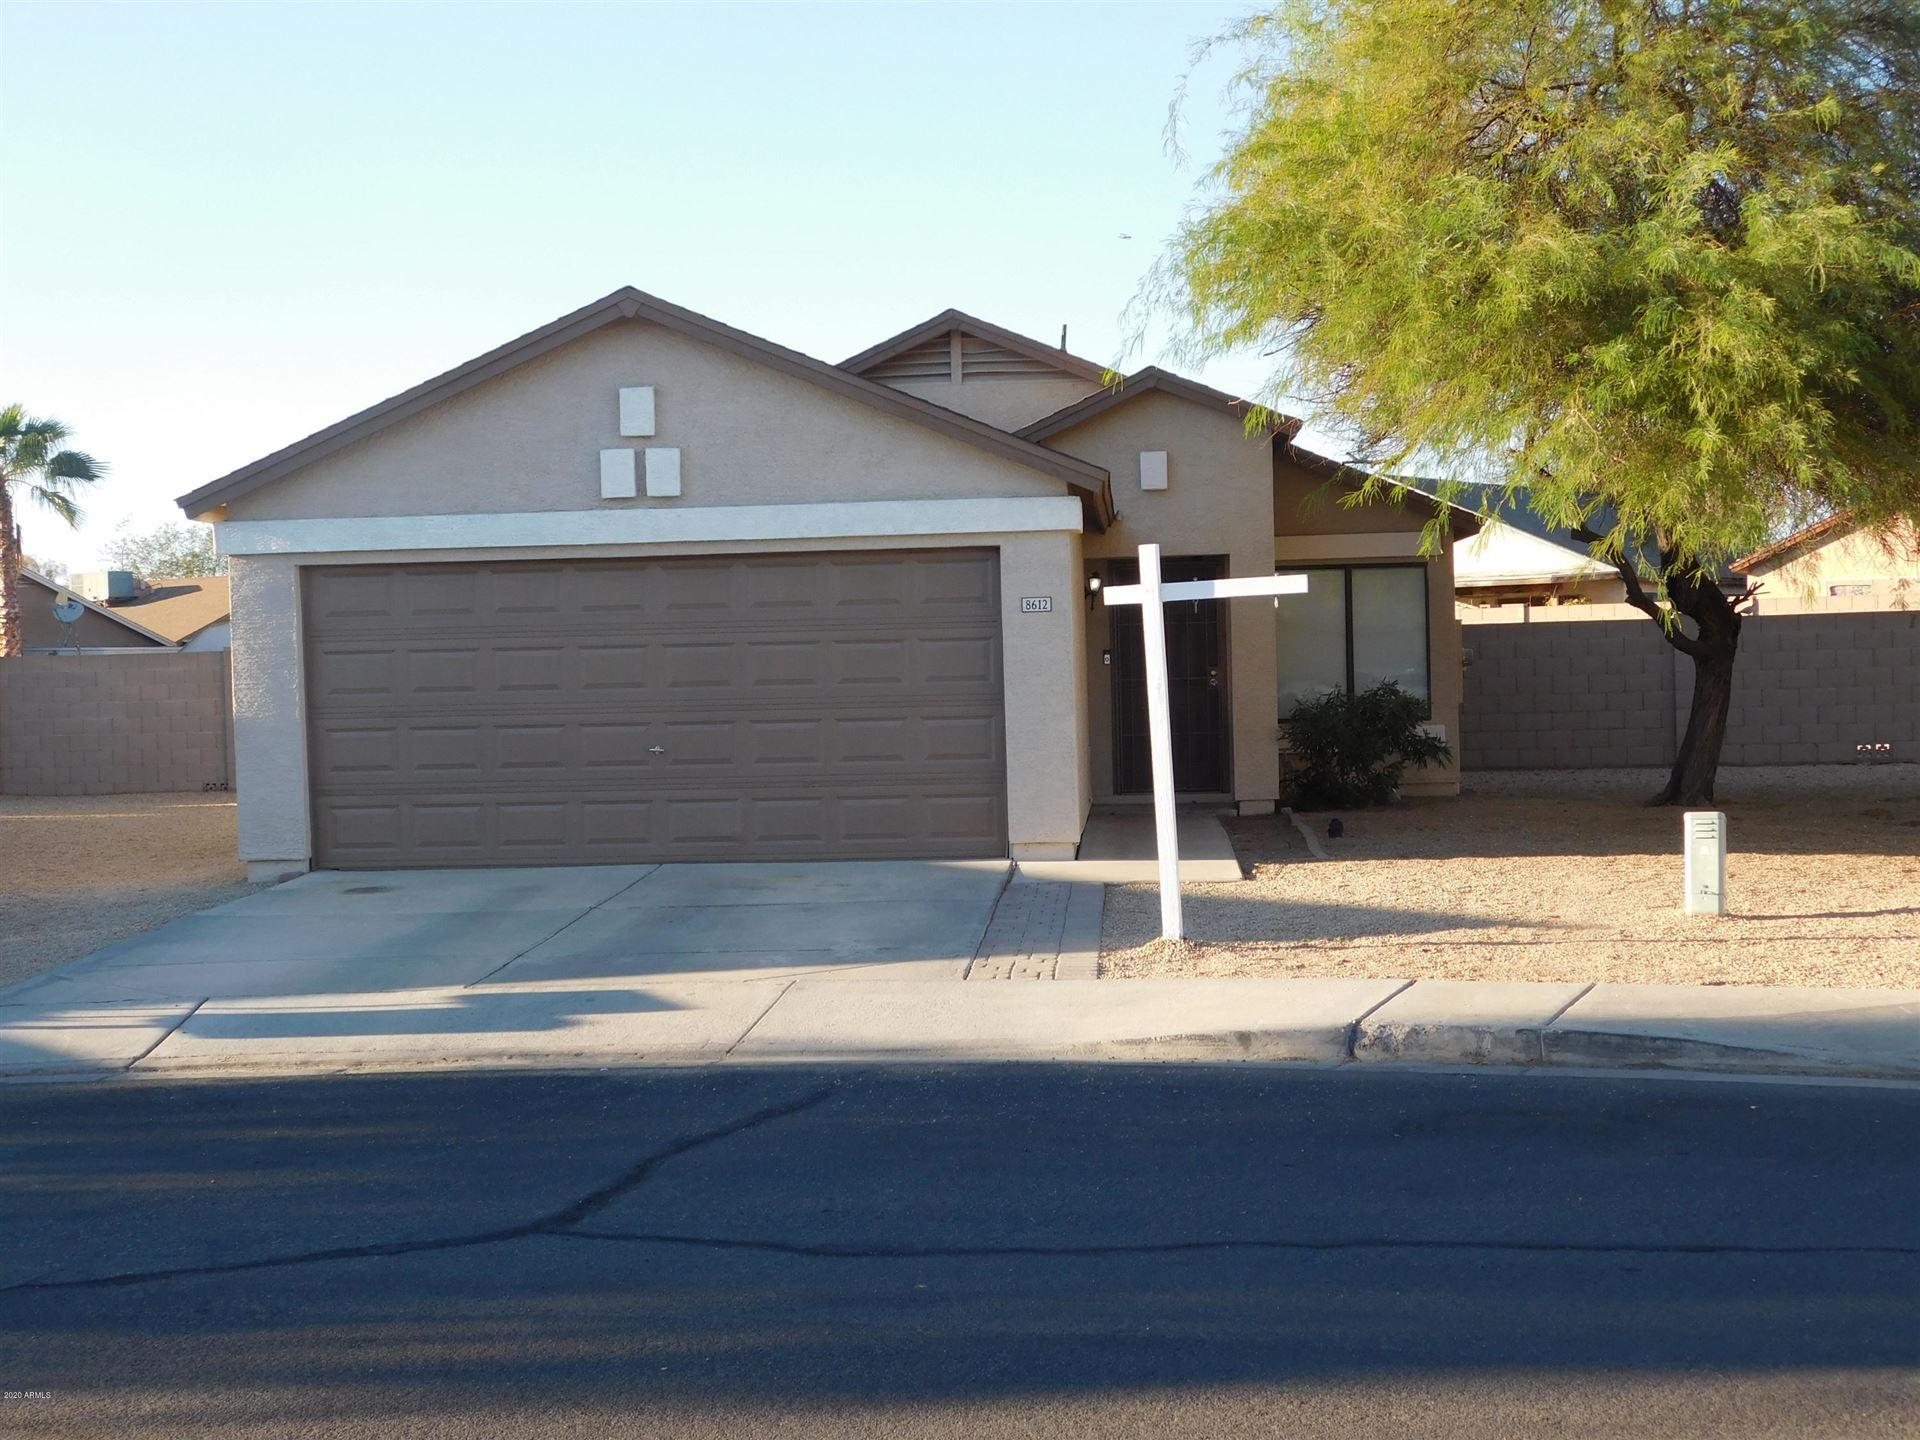 8612 W ELM Street, Phoenix, AZ 85037 - MLS#: 6160440